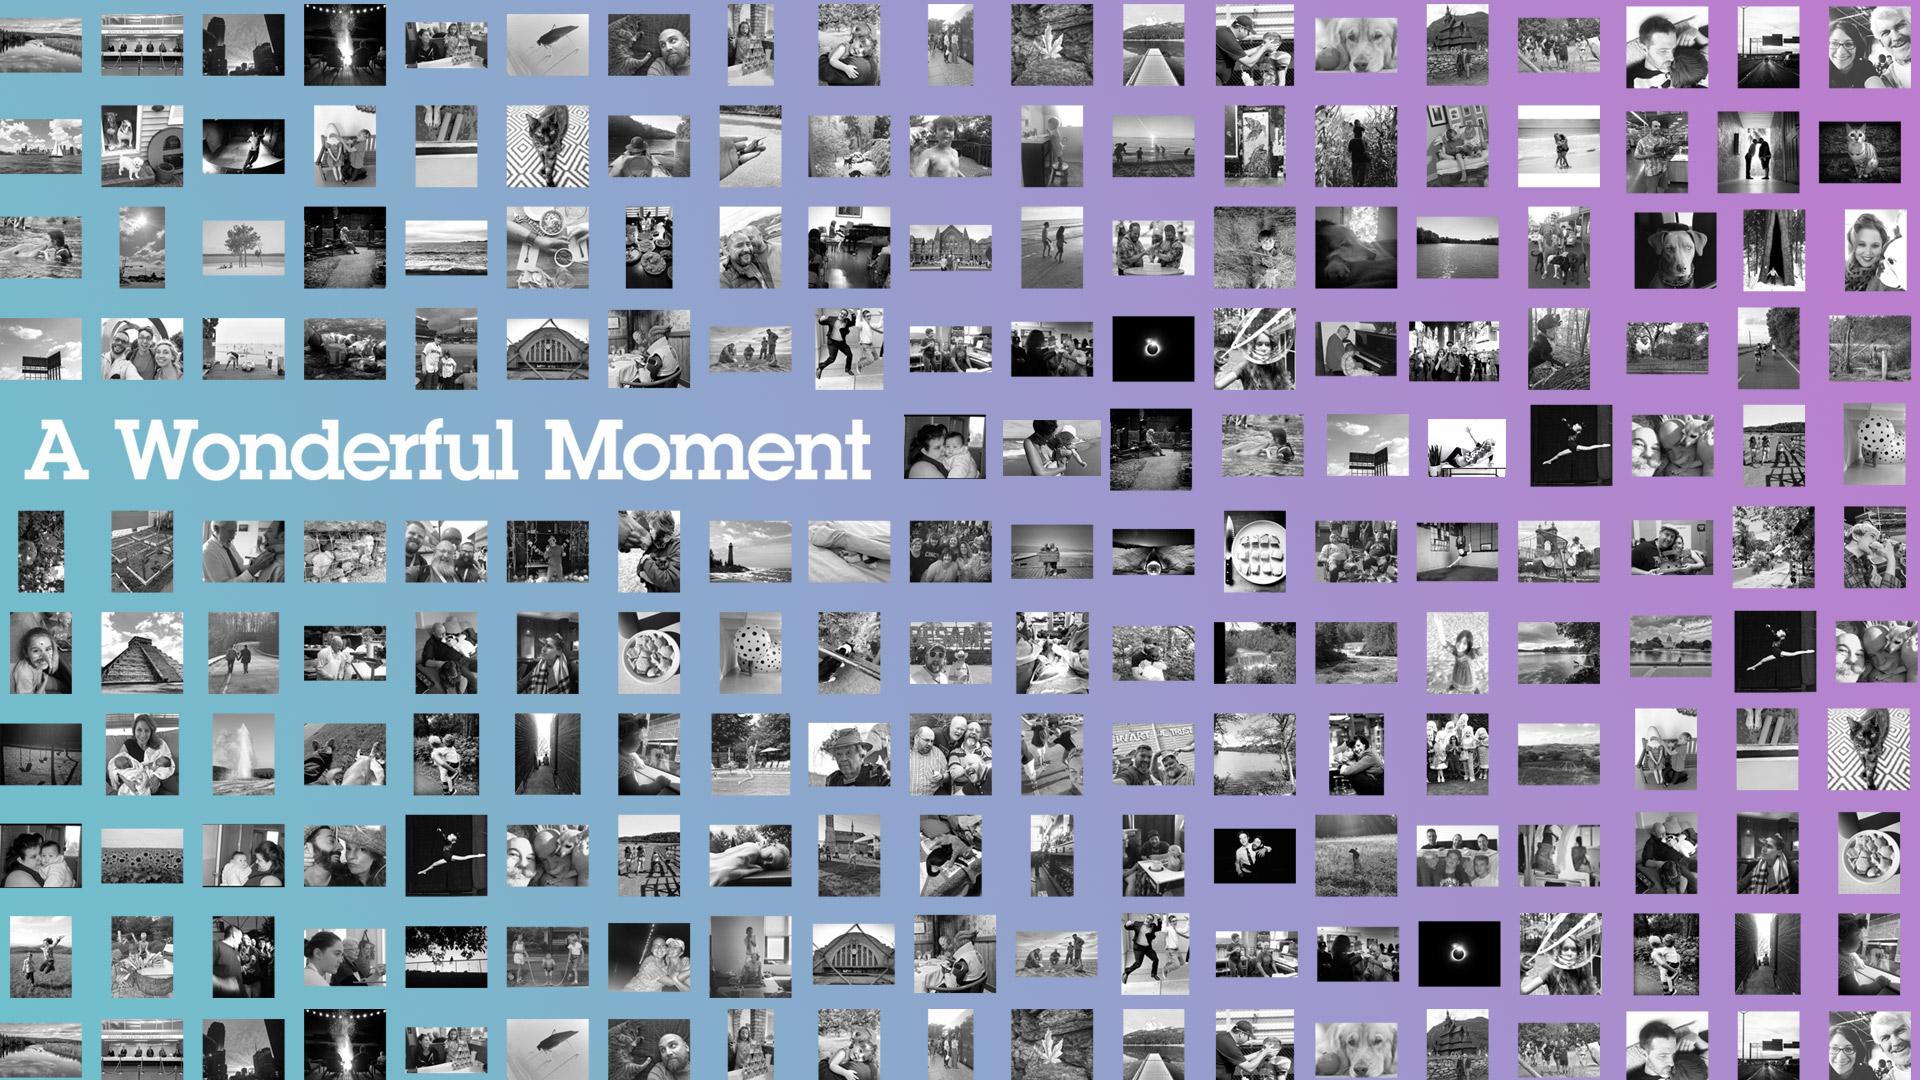 wonderful-moment-image.jpg